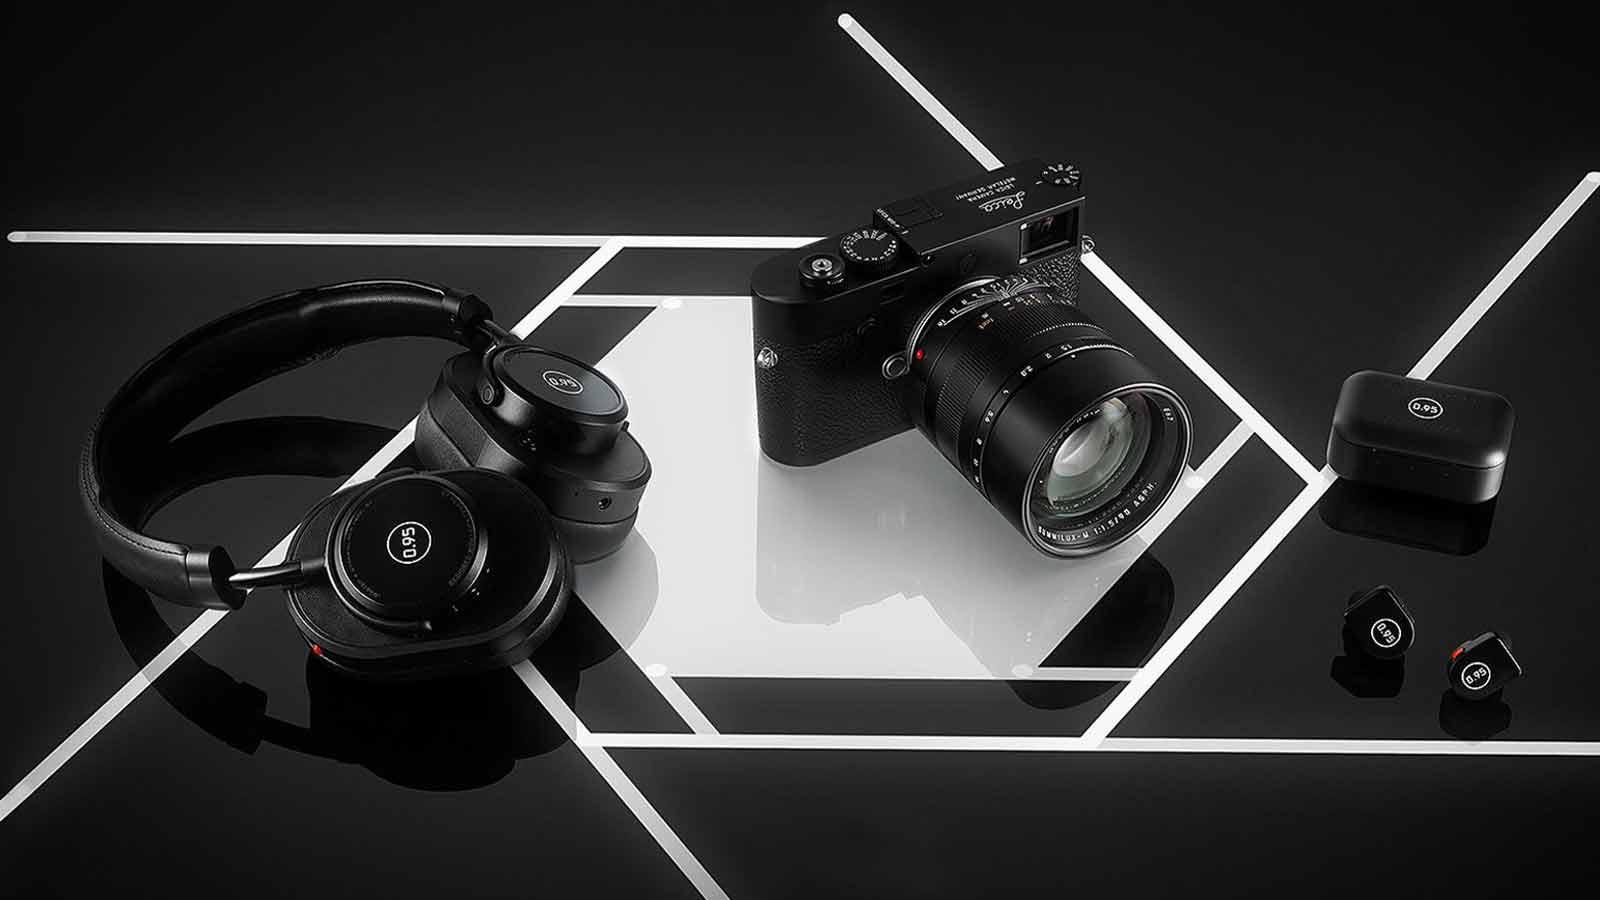 Master & Dynamic x Leica 0.95 Collaboration